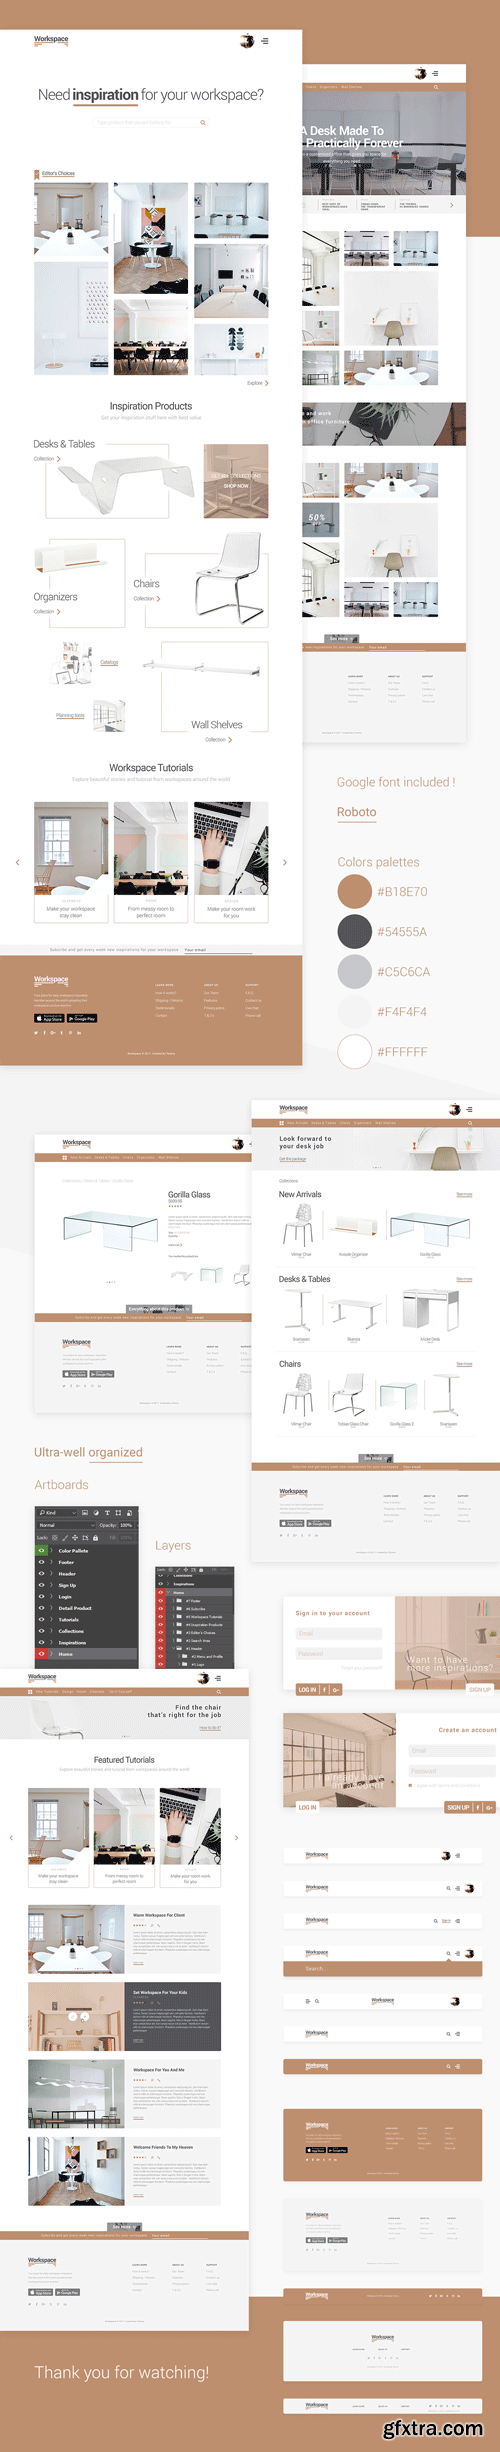 Workspace - E-Commerce PSD Kit